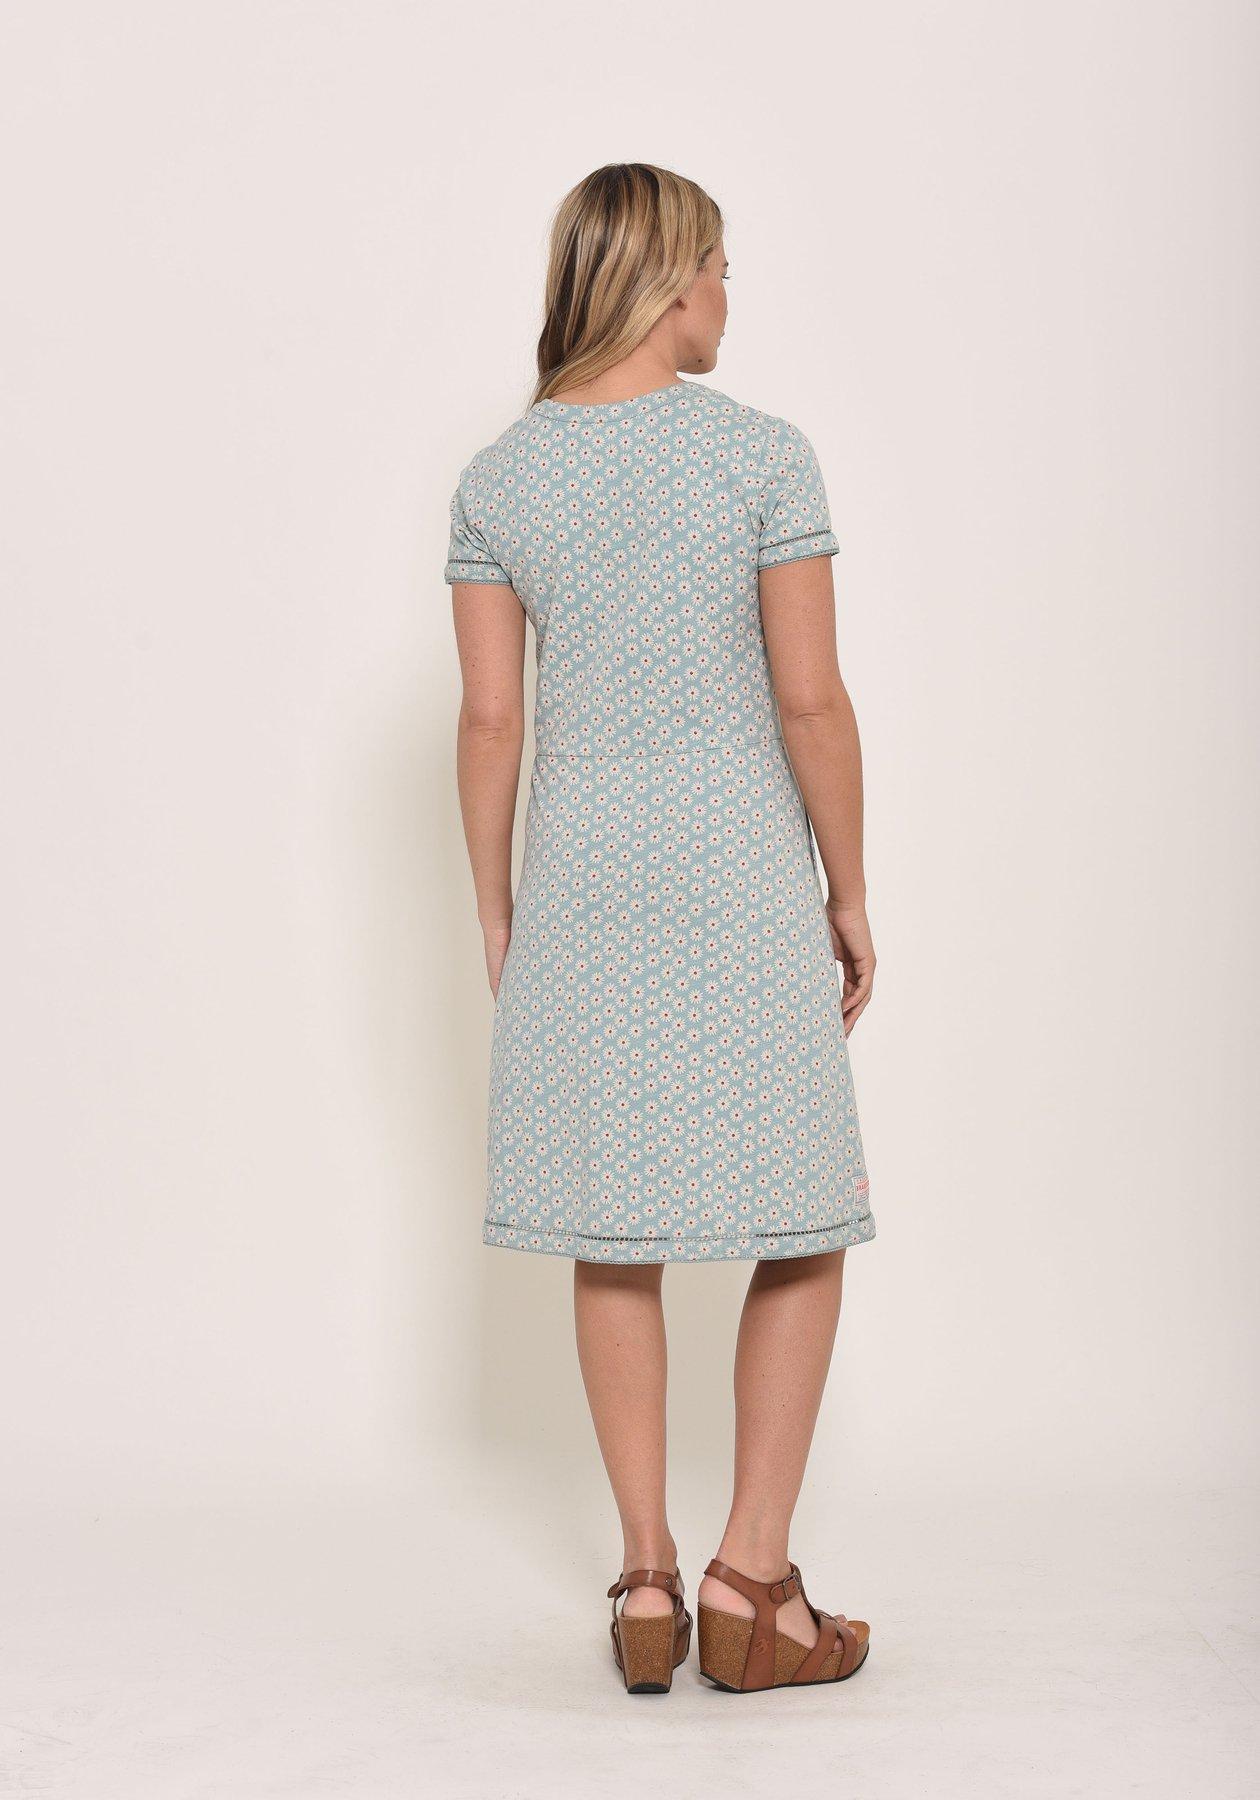 Brakeburn daisy jersey dress